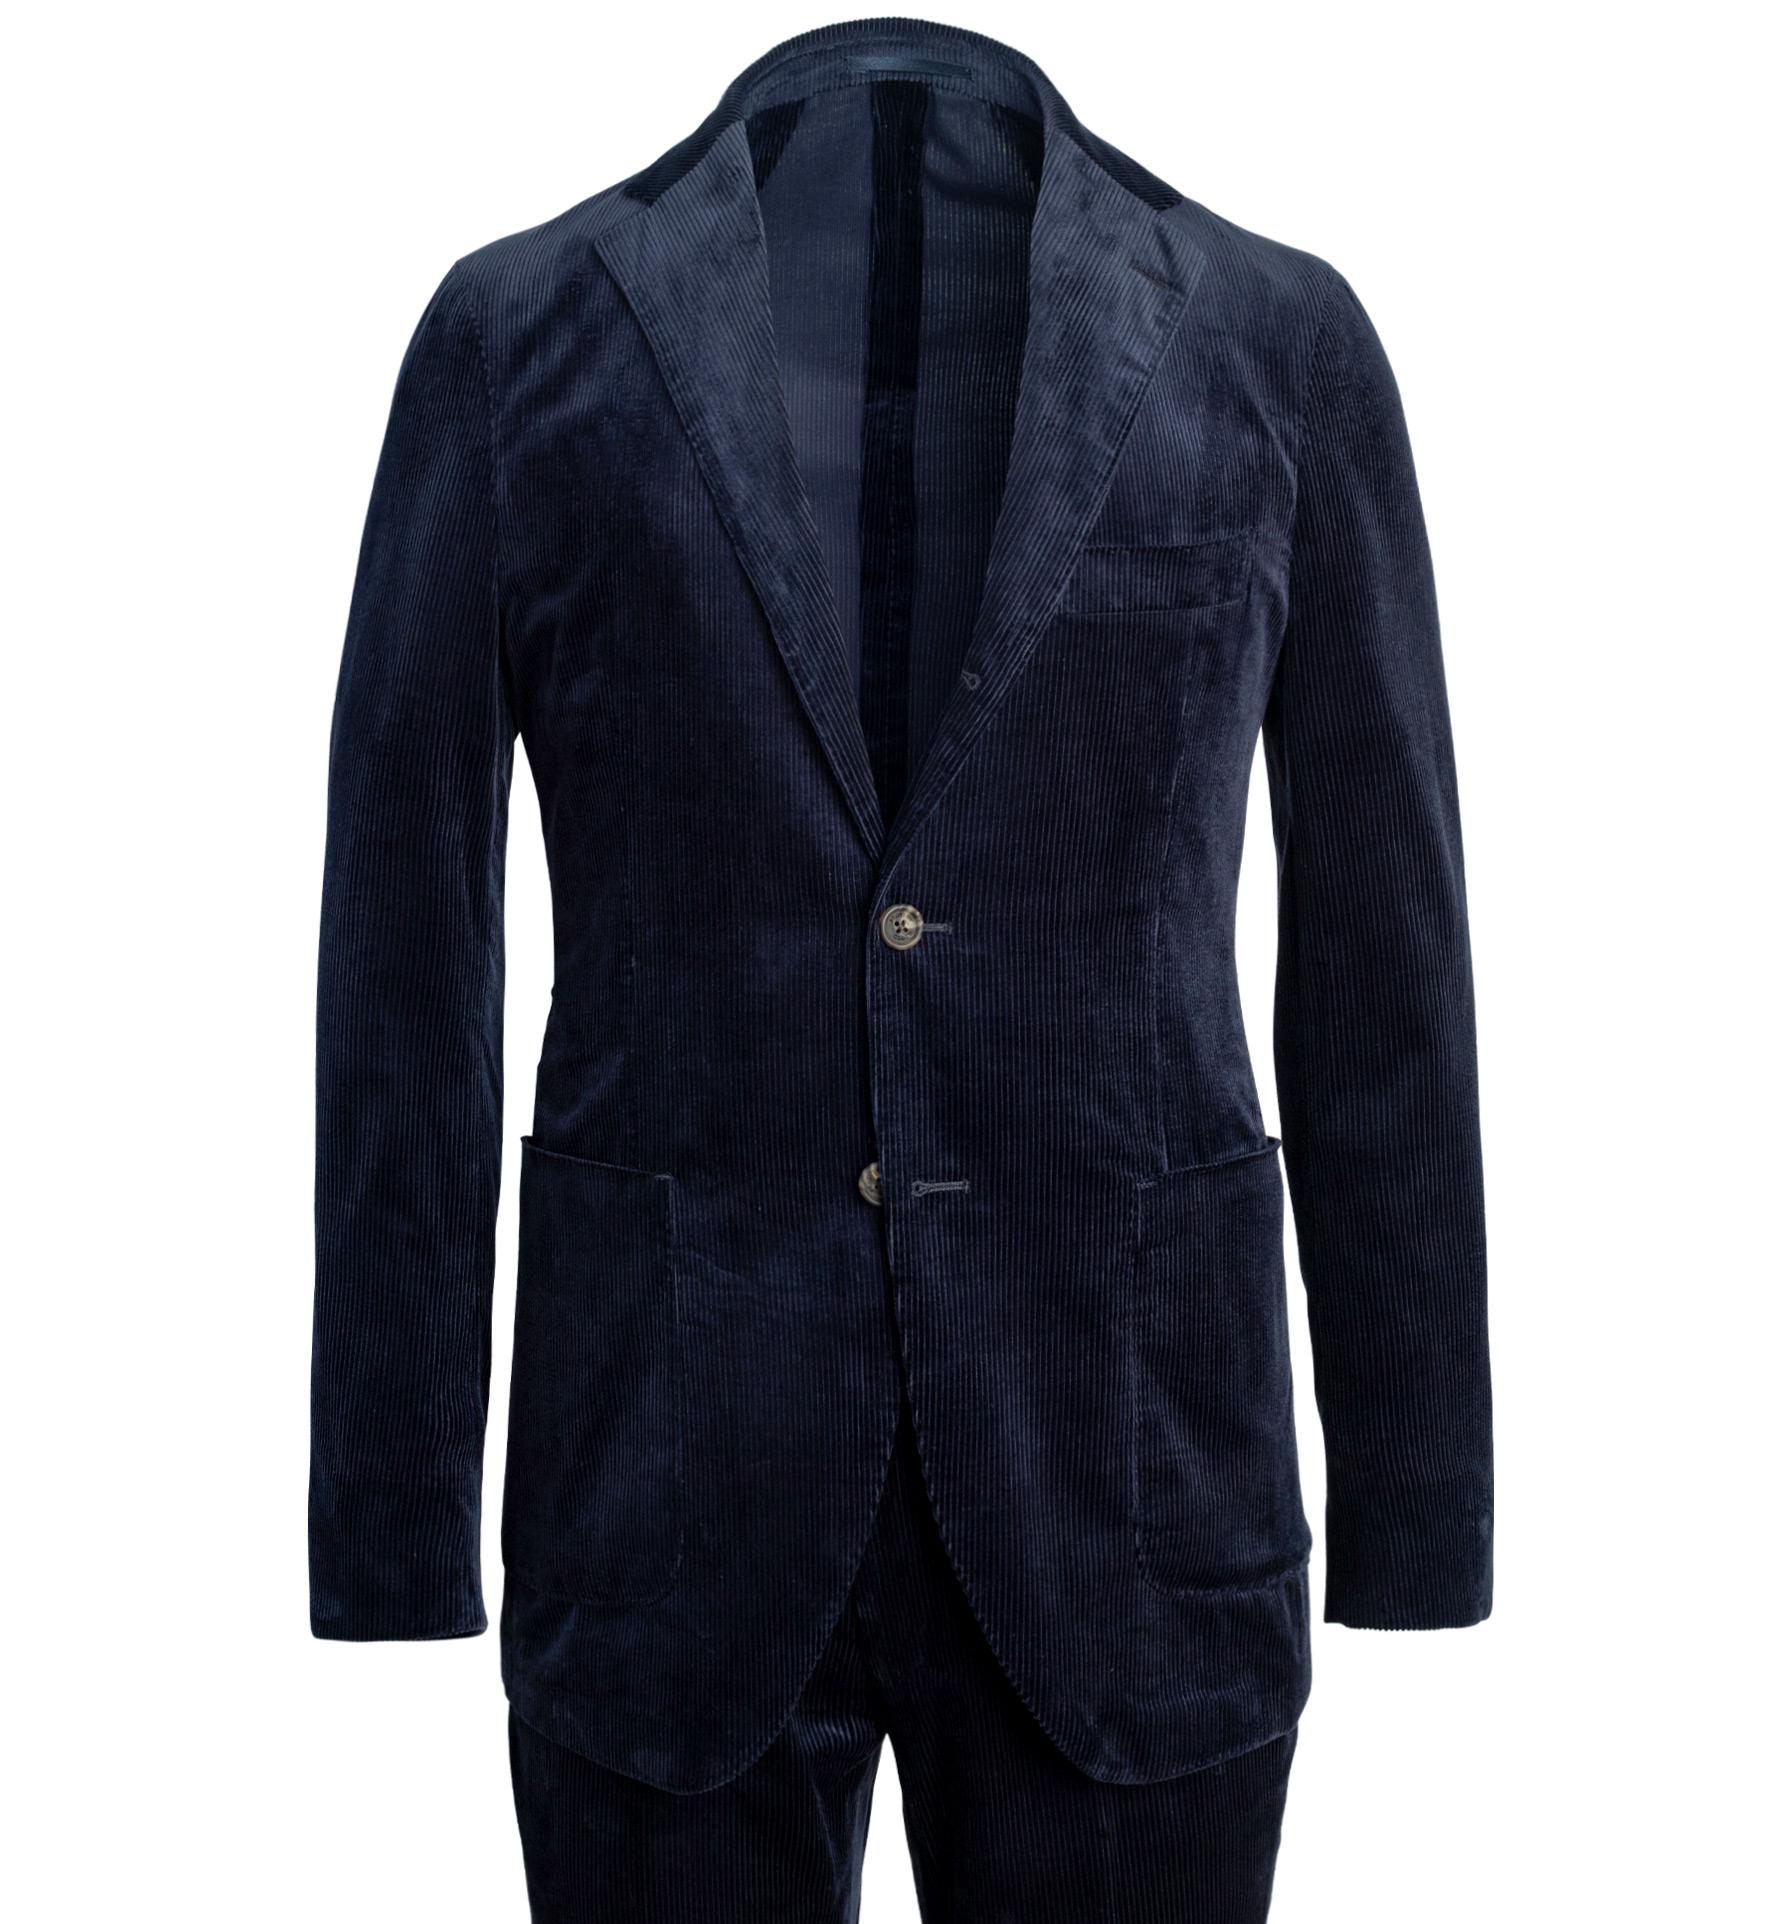 Zoom Image of Waverly Navy Lightweight Supima Corduroy Suit